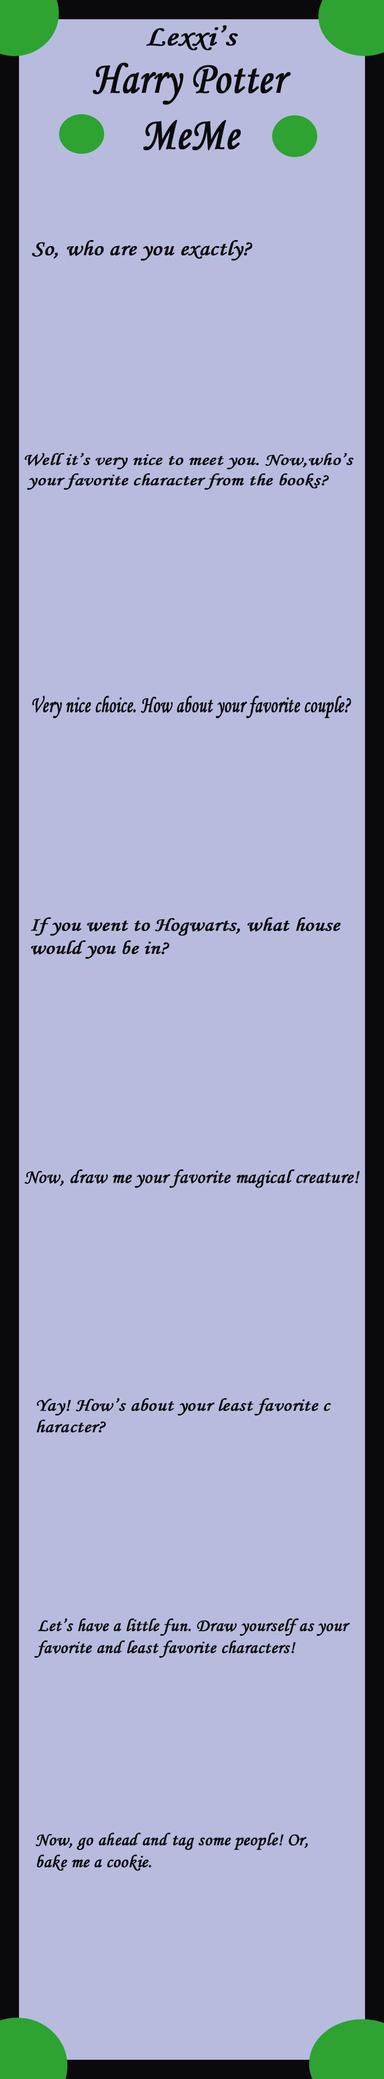 Harry Potter Meme - Original by Sparkle-And-Sunshine